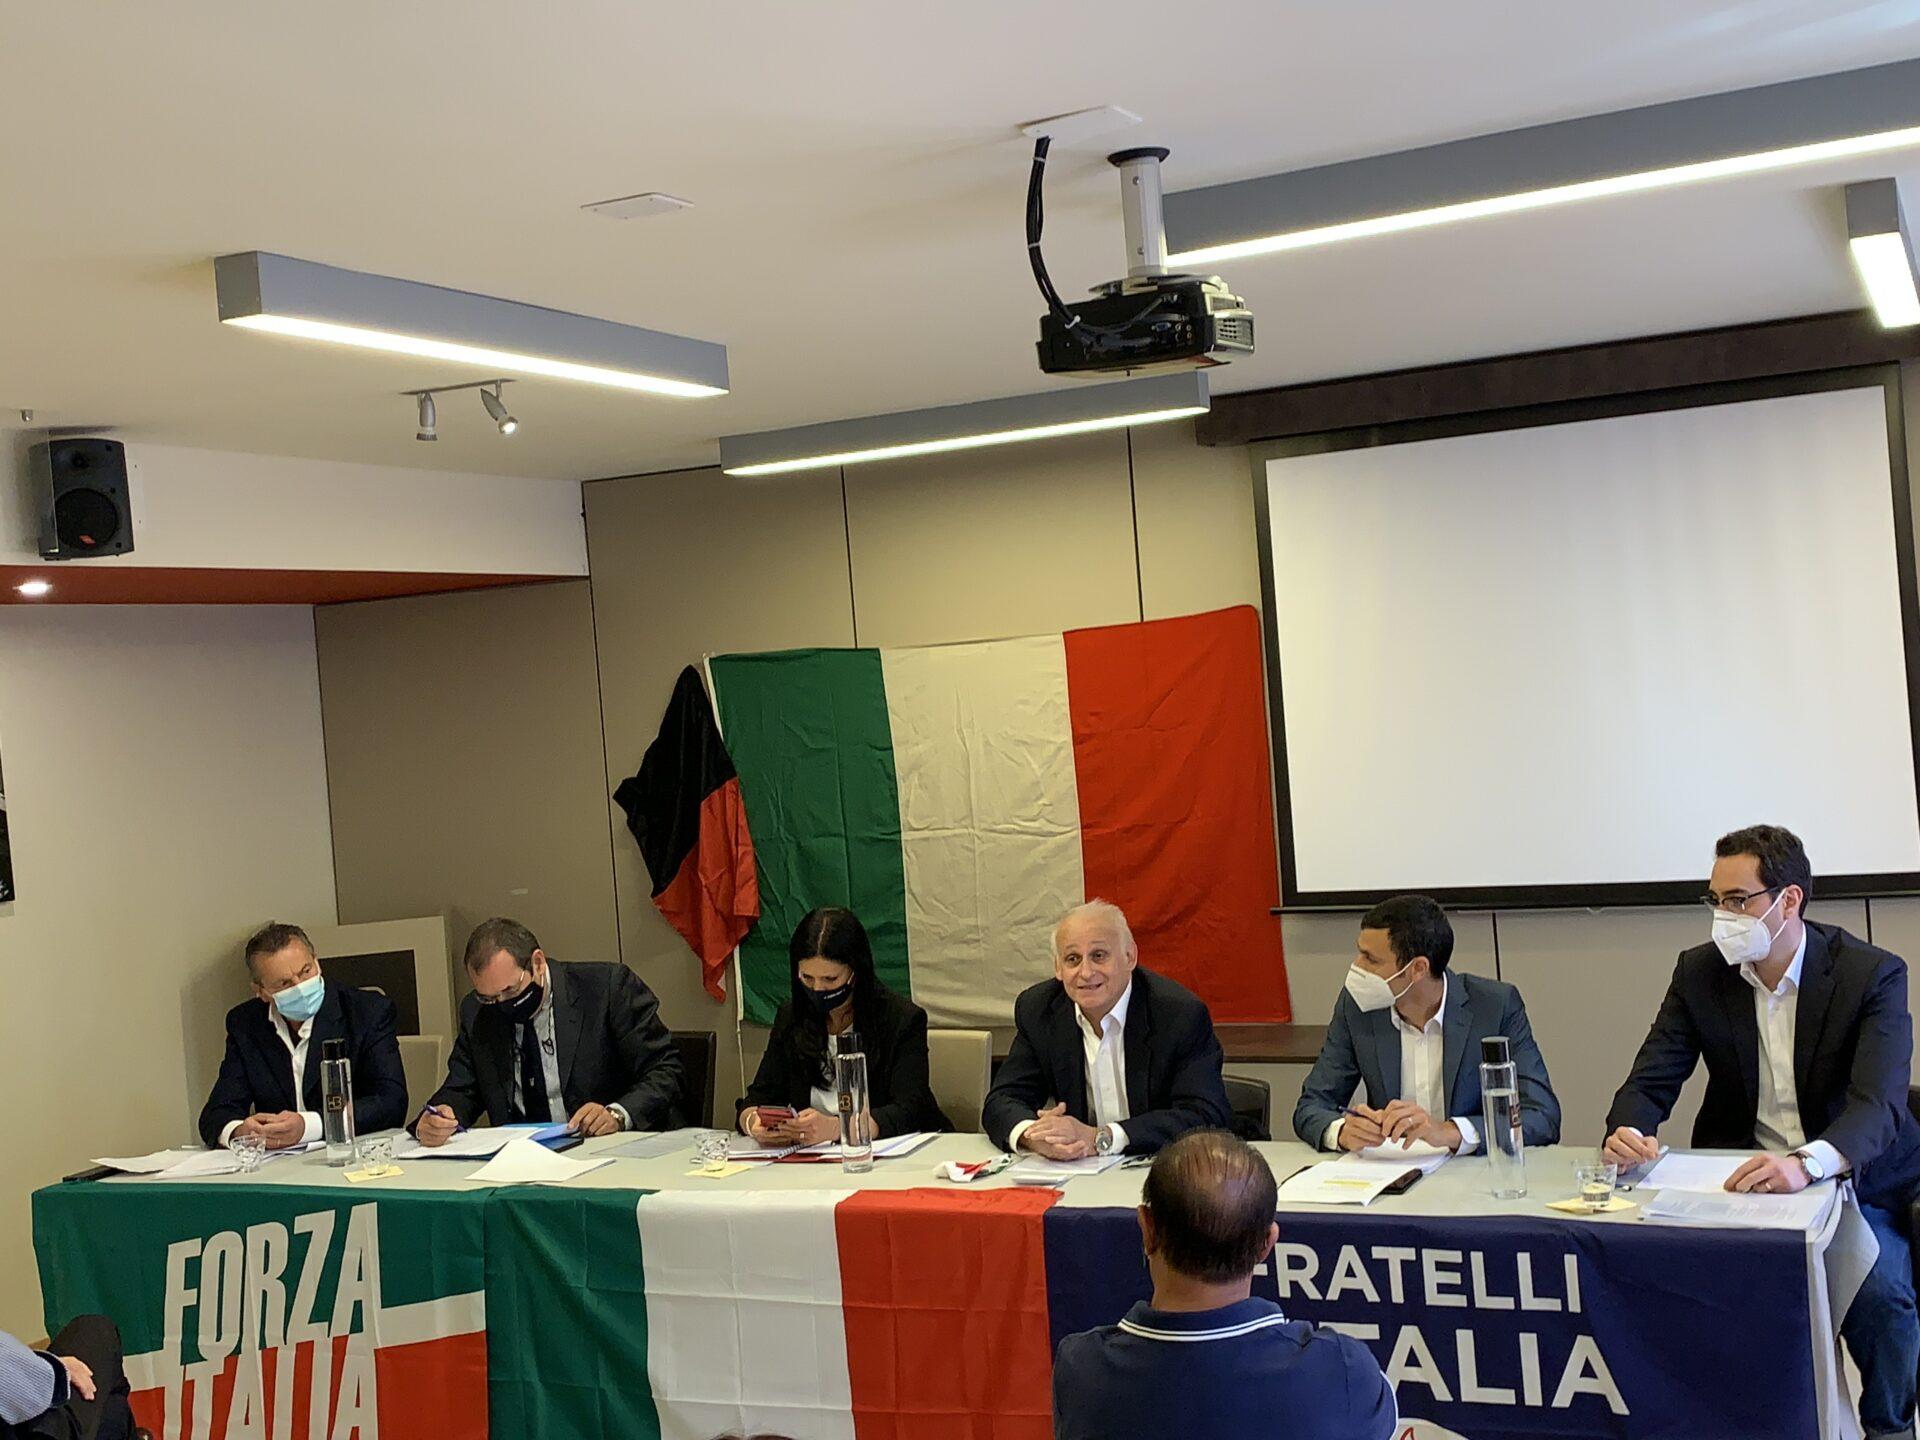 Zucchi, Rini, front Valdotain, Forza italia